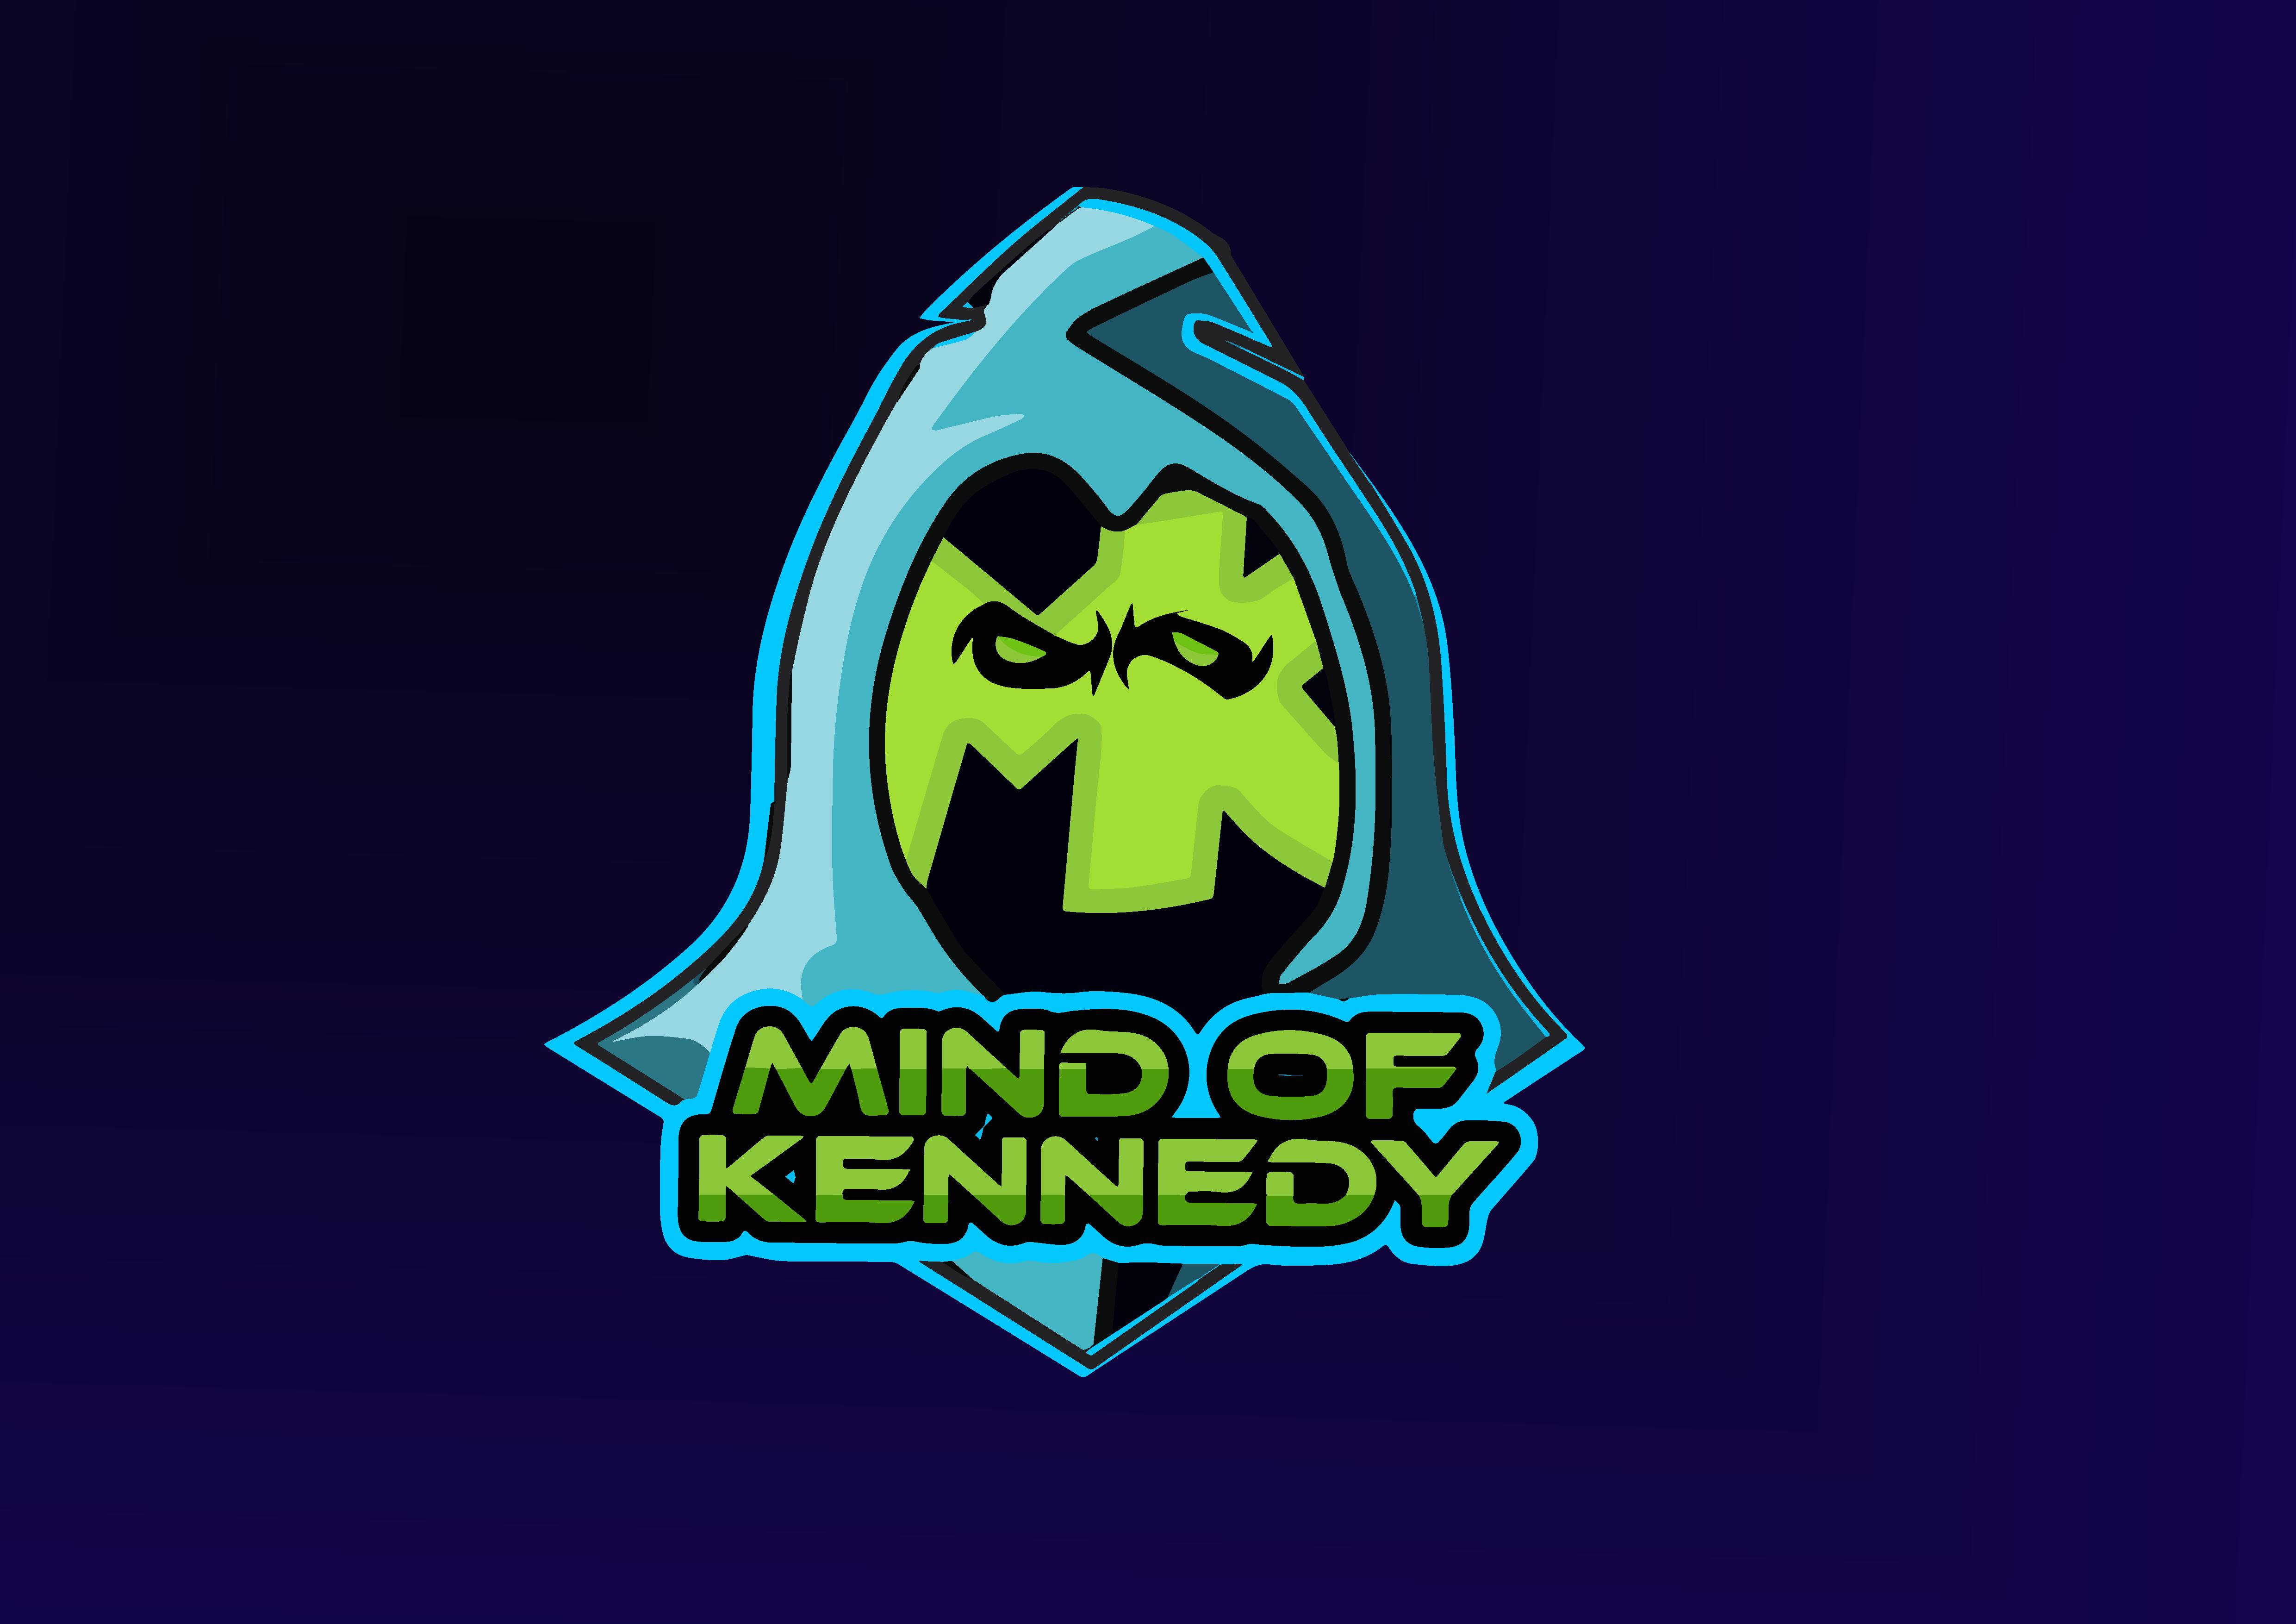 Kennedy's YouTube channel logo design